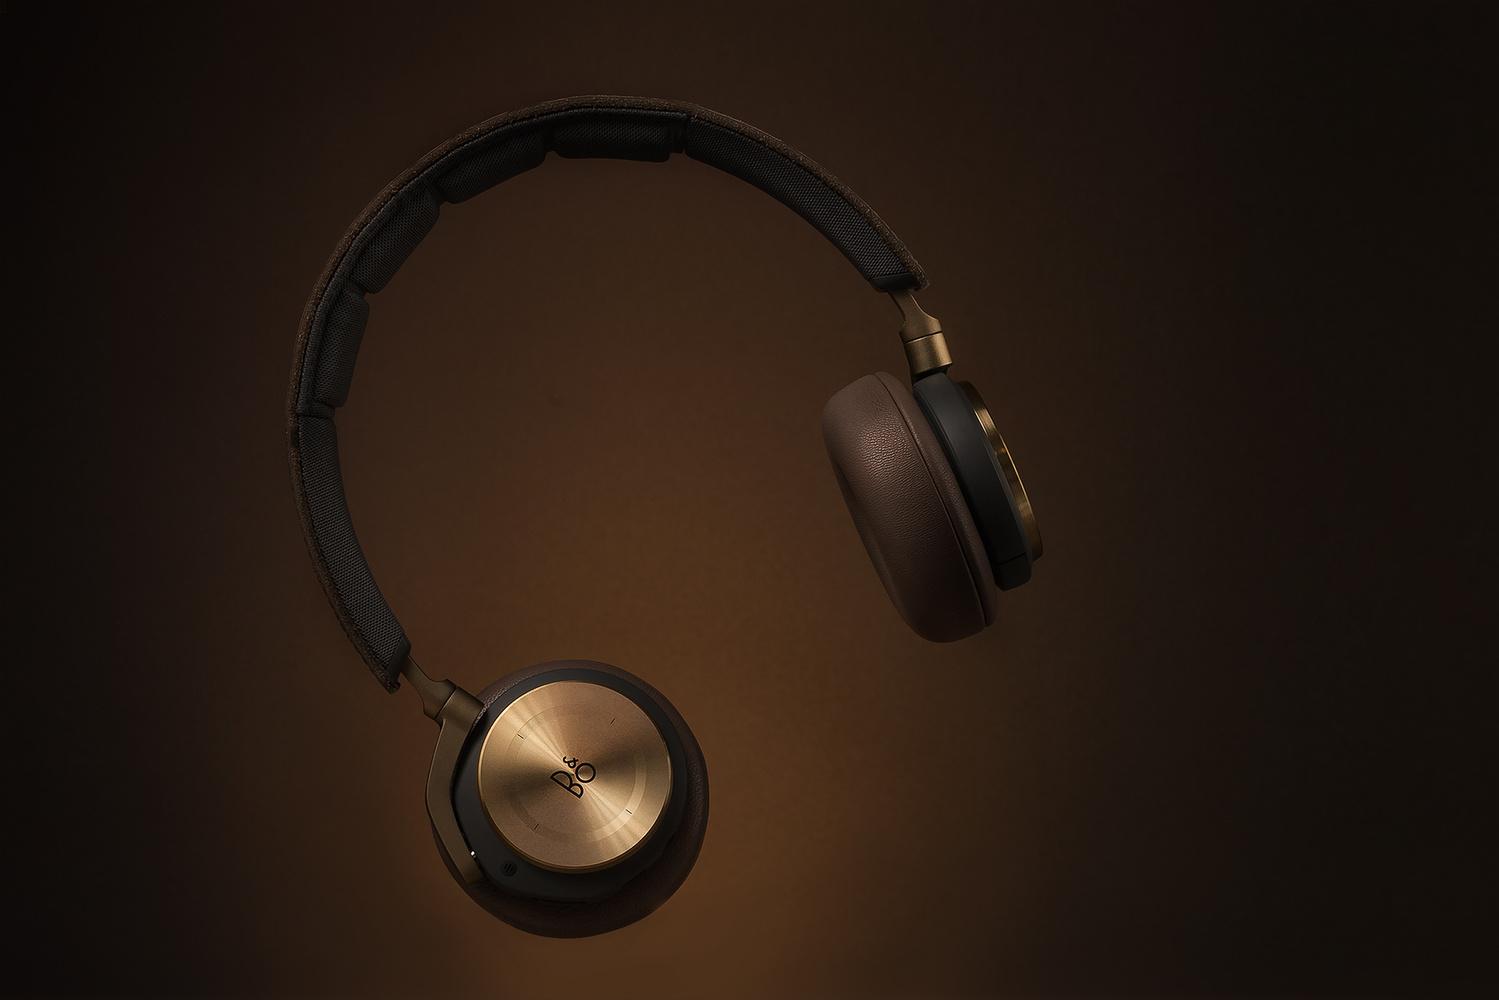 bo_headphones_3.jpg